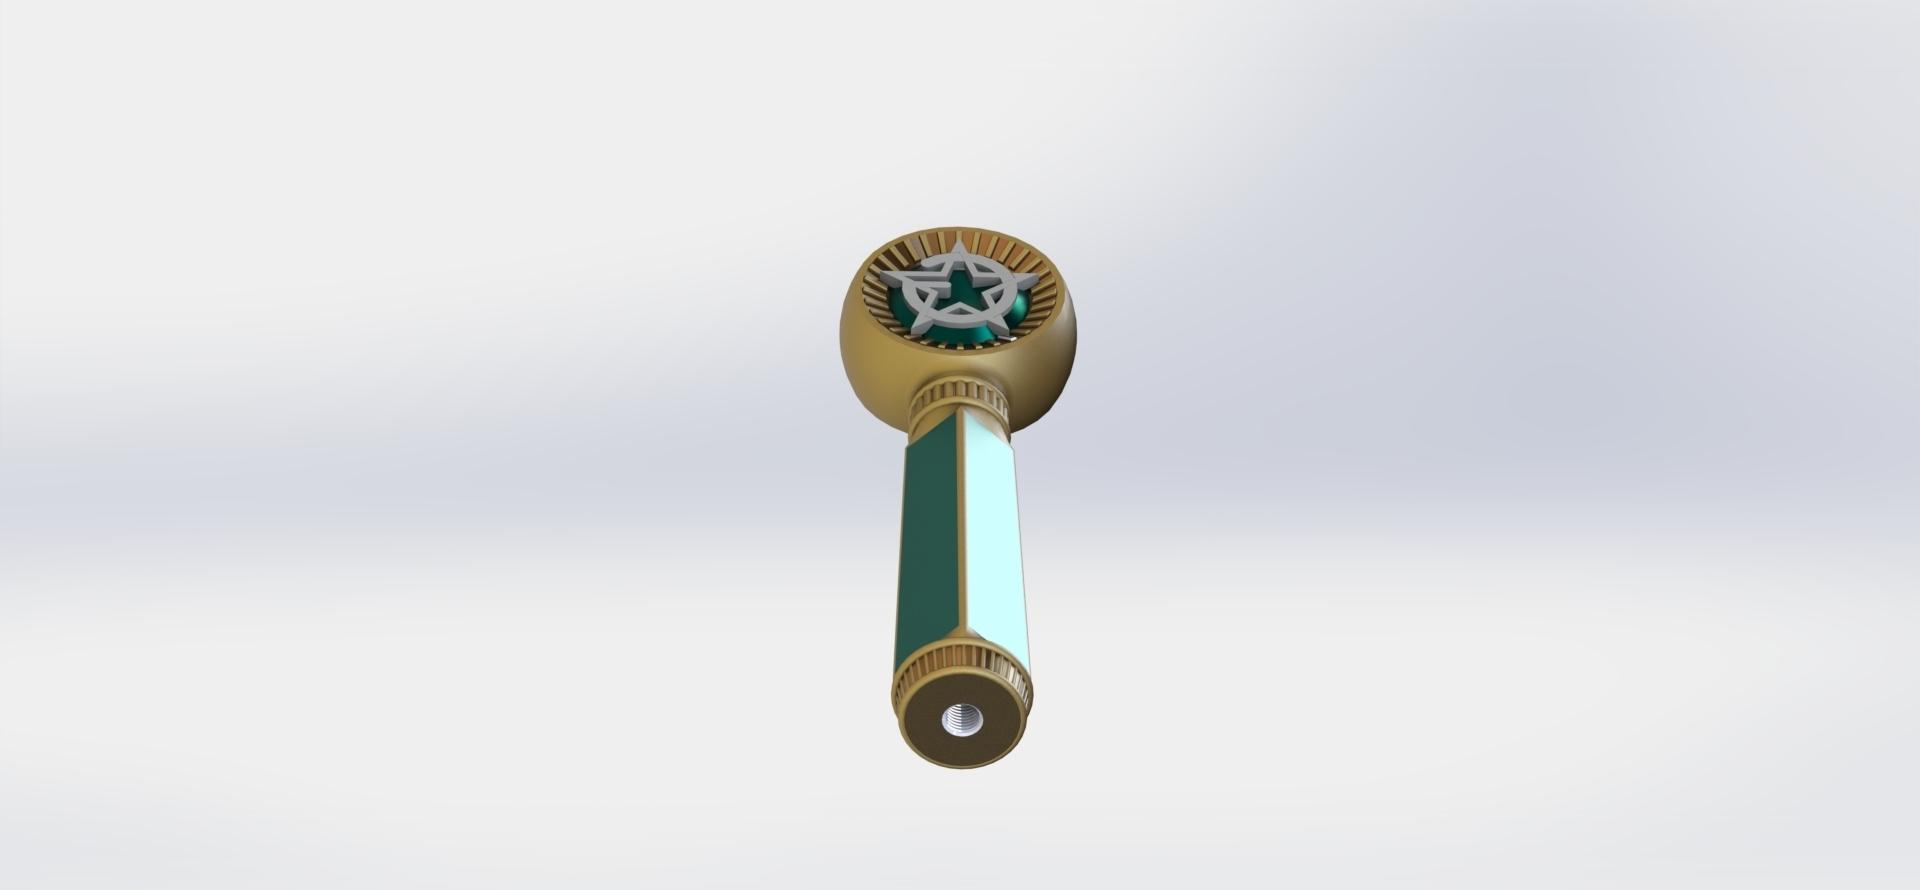 preview13.JPG Download STL file Masonic Ceremony Sword-Ready 3D Print • 3D printable template, GokBoru